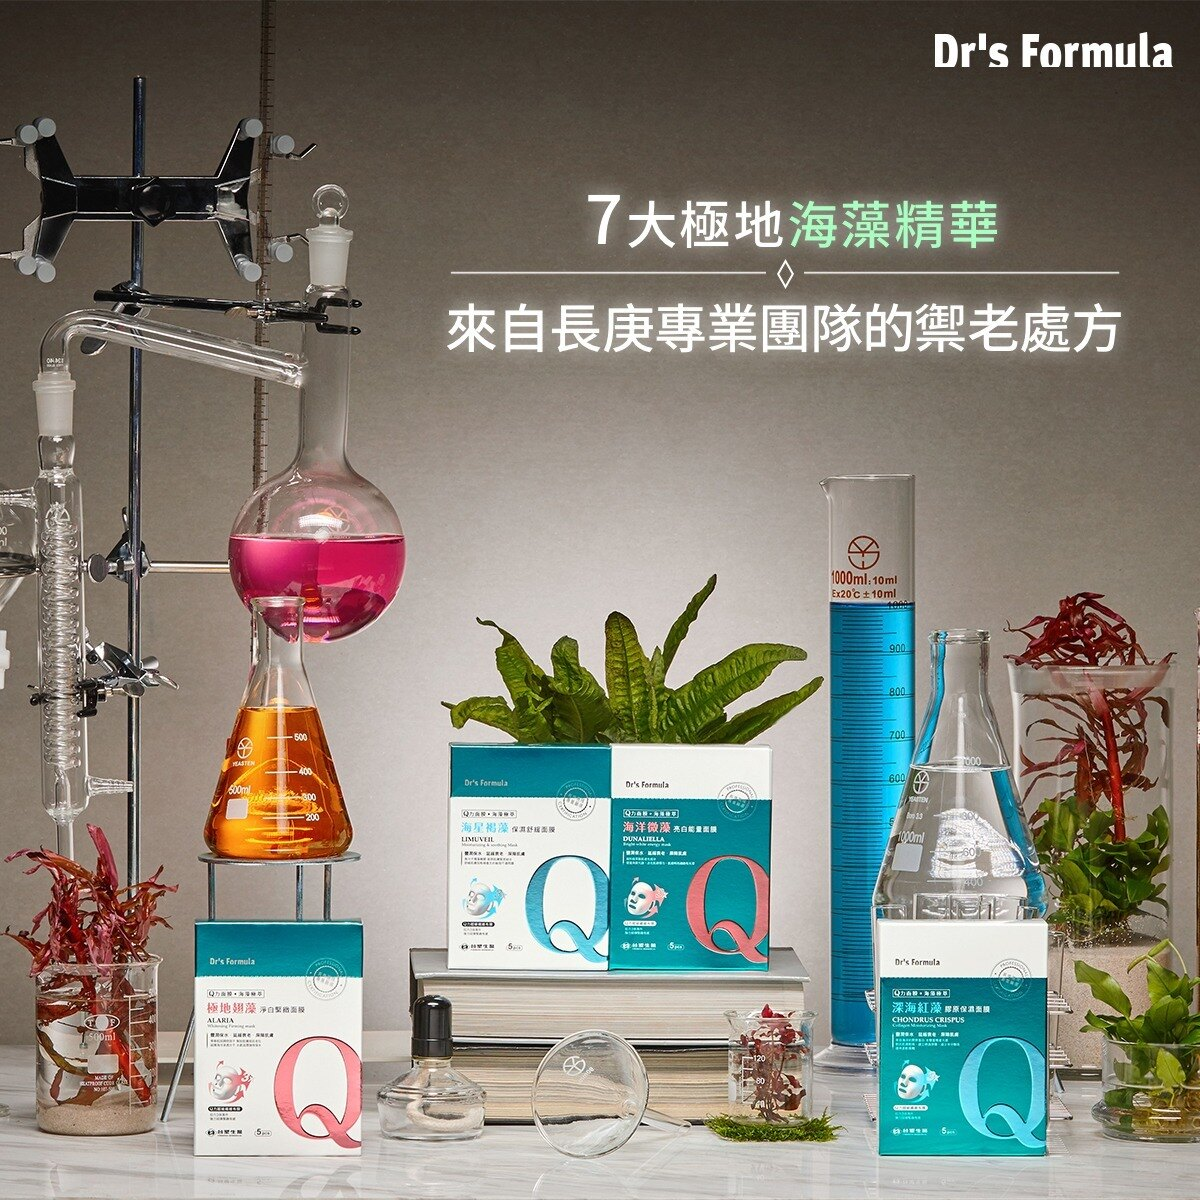 3D面膜 4款任選Dr's Formula 海藻系列 保濕/舒緩/亮白/緊緻 面膜(5片裝)